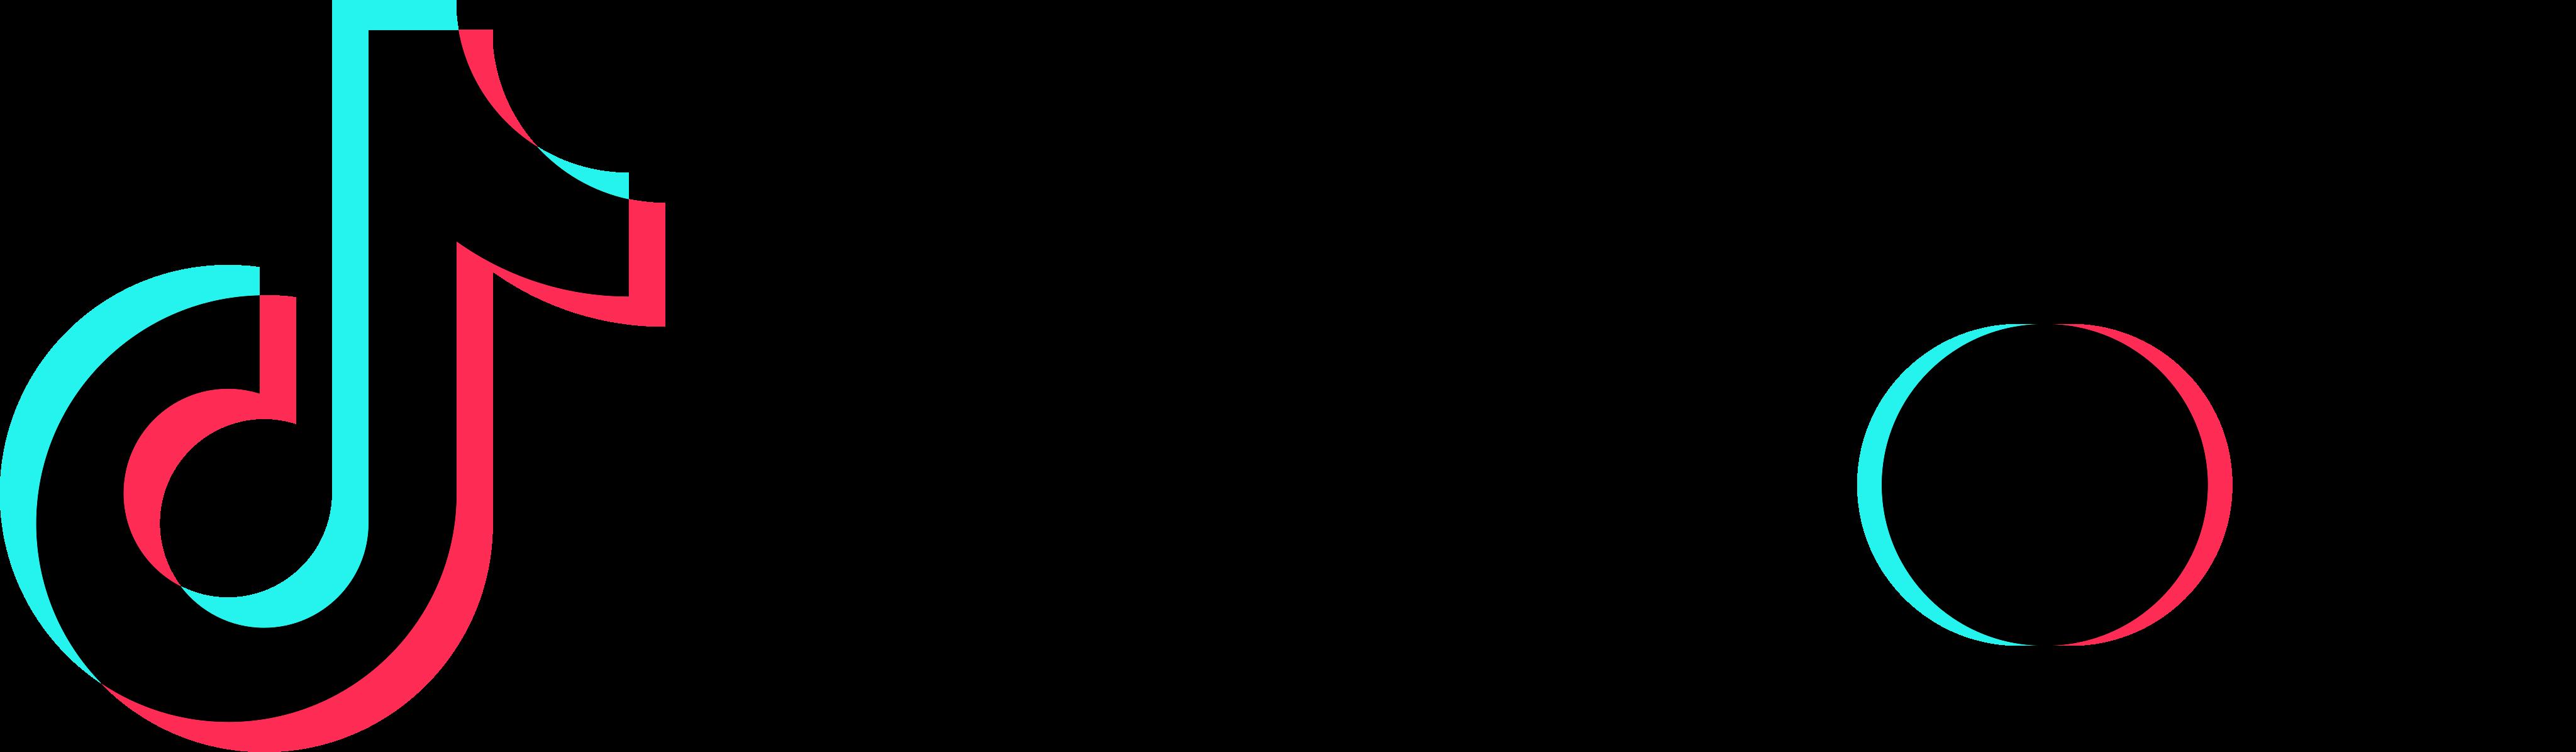 Tiktok Logo Png And Vector Logo Download